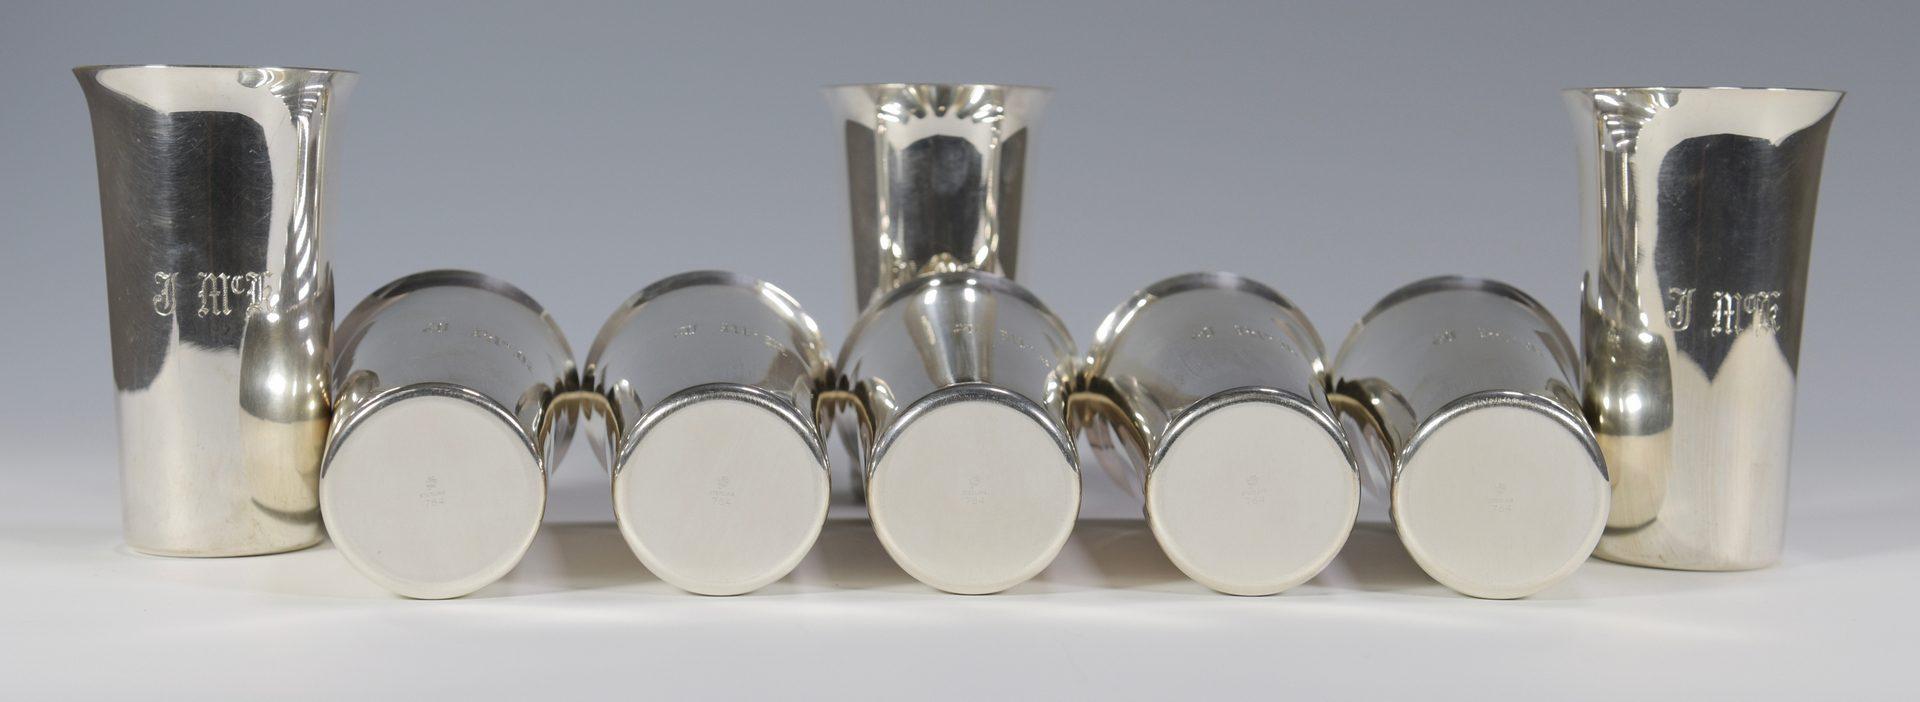 Lot 865: Assembled Set 8 Sterling Silver Beakers